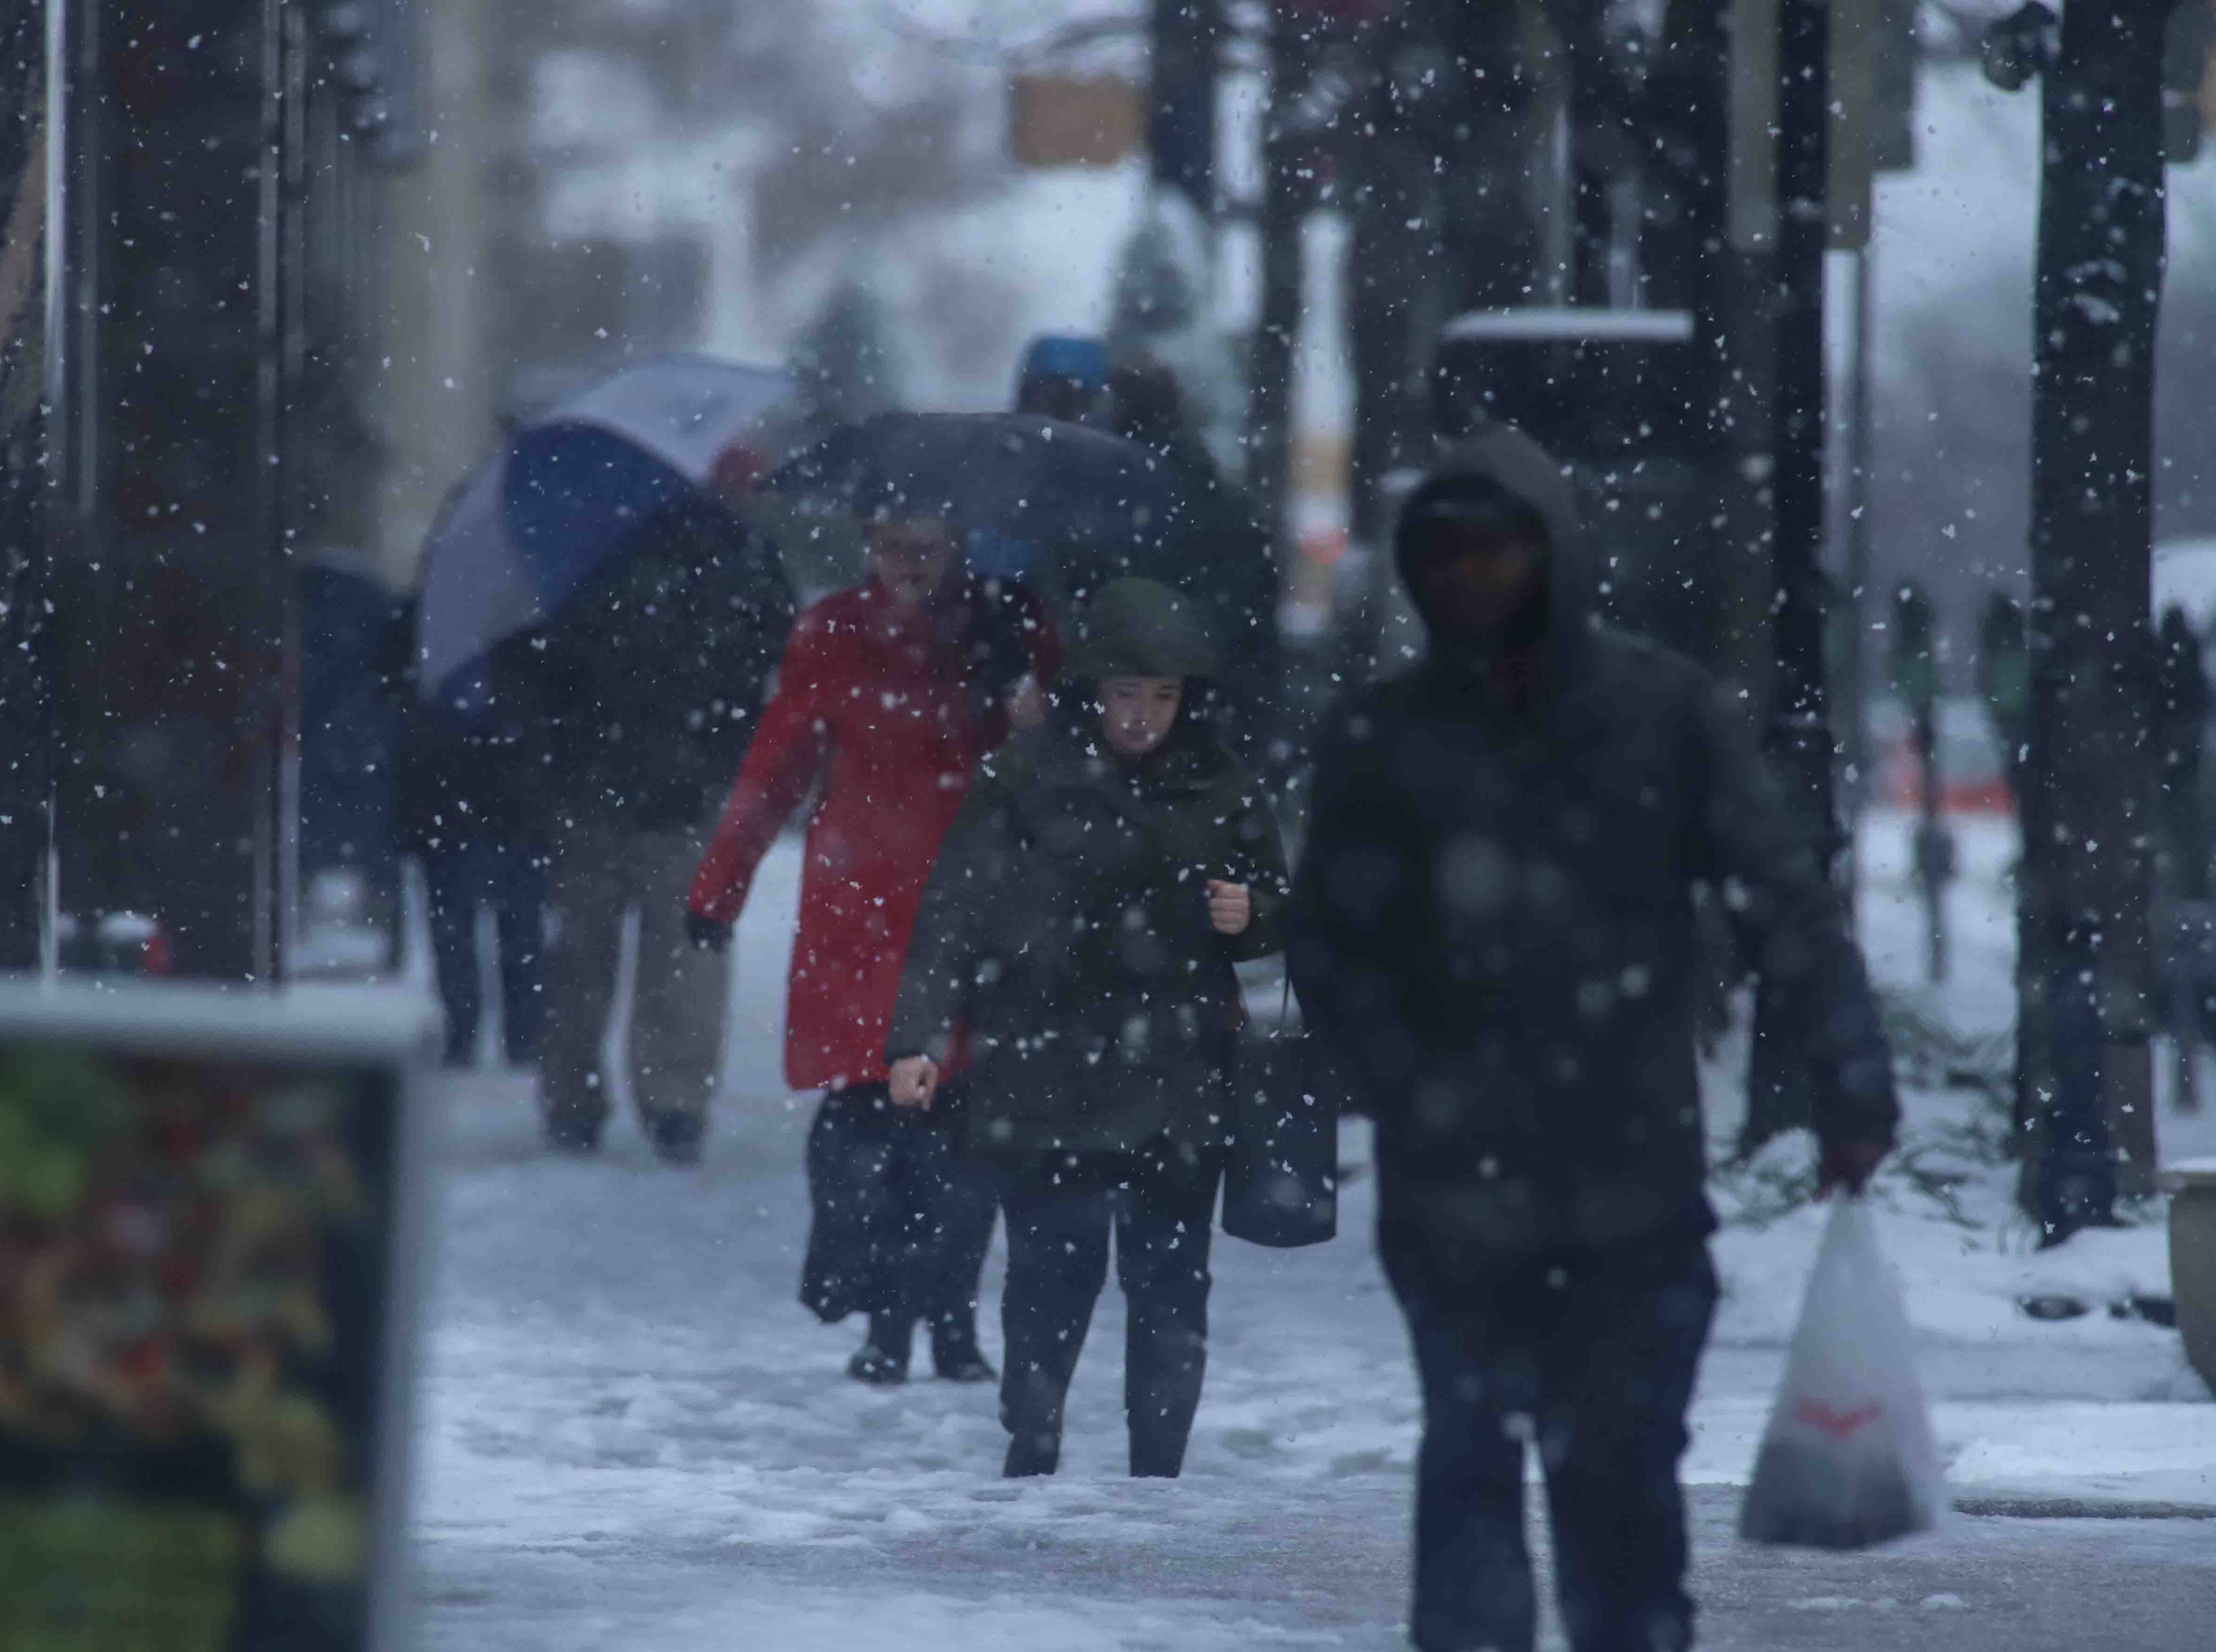 Pedestrians walking down Market Street during heavy snowfall on Thursday, Nov. 15, 2018, in Wilmington.